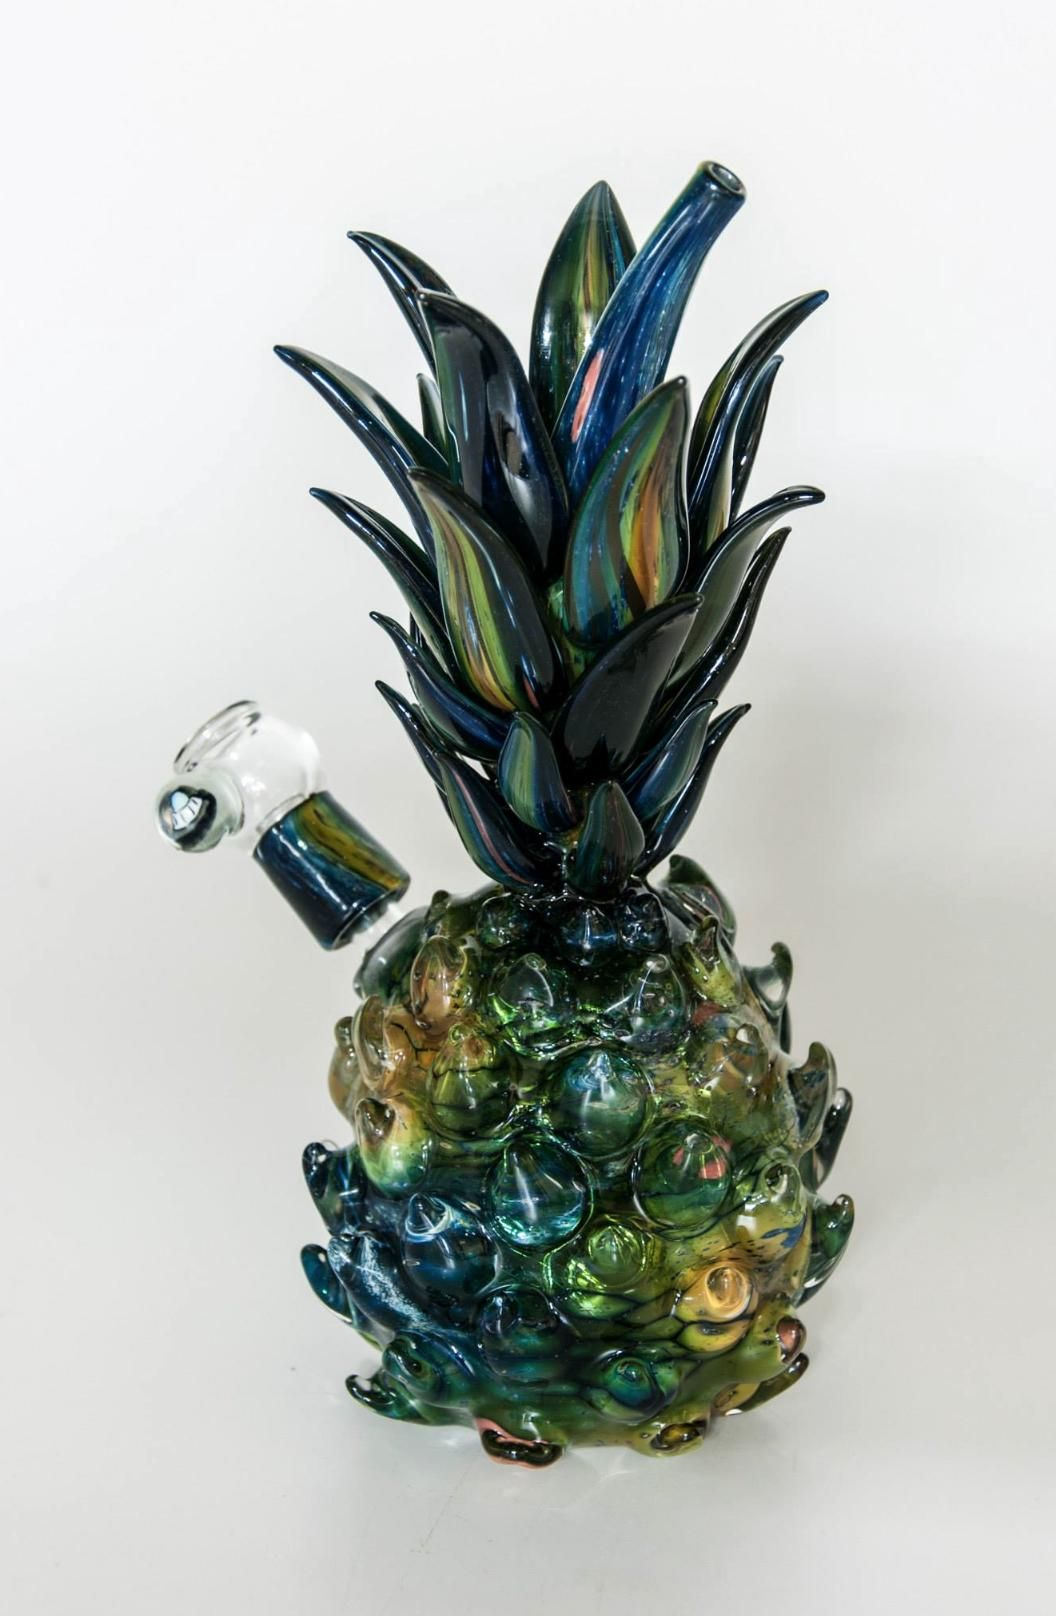 pineapple bong weed glass dope smoking progress coole bongs kiffen und unkraut. Black Bedroom Furniture Sets. Home Design Ideas